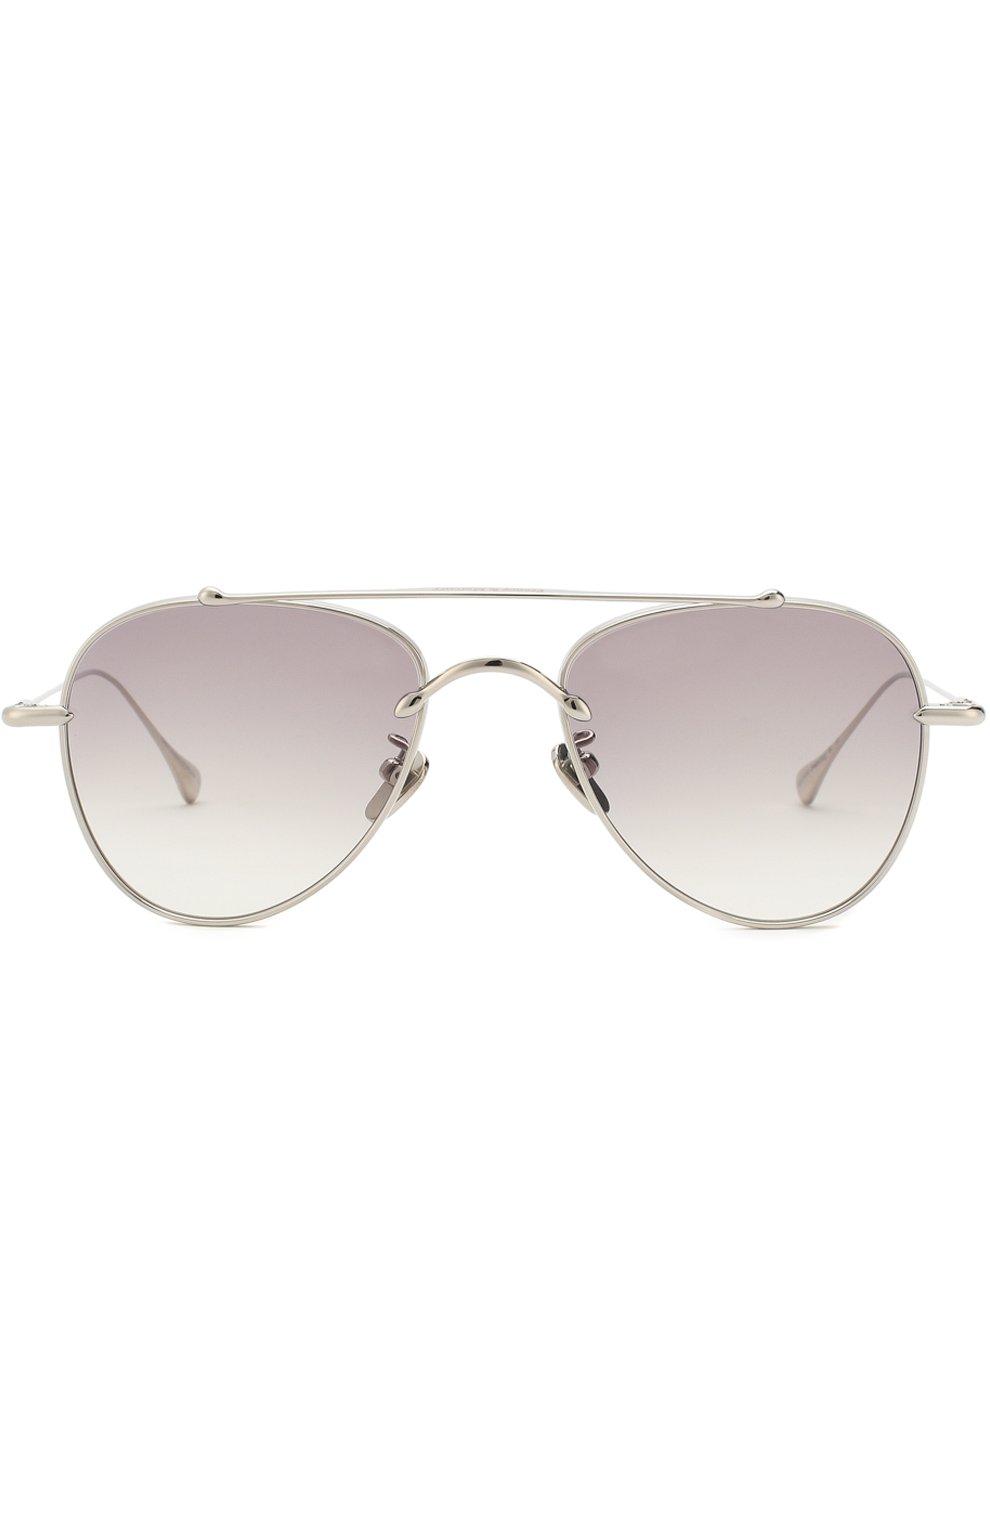 Женские солнцезащитные очки FRENCY&MERCURY серебряного цвета, арт. EG0ISTIC SUNDAY III/SS | Фото 2